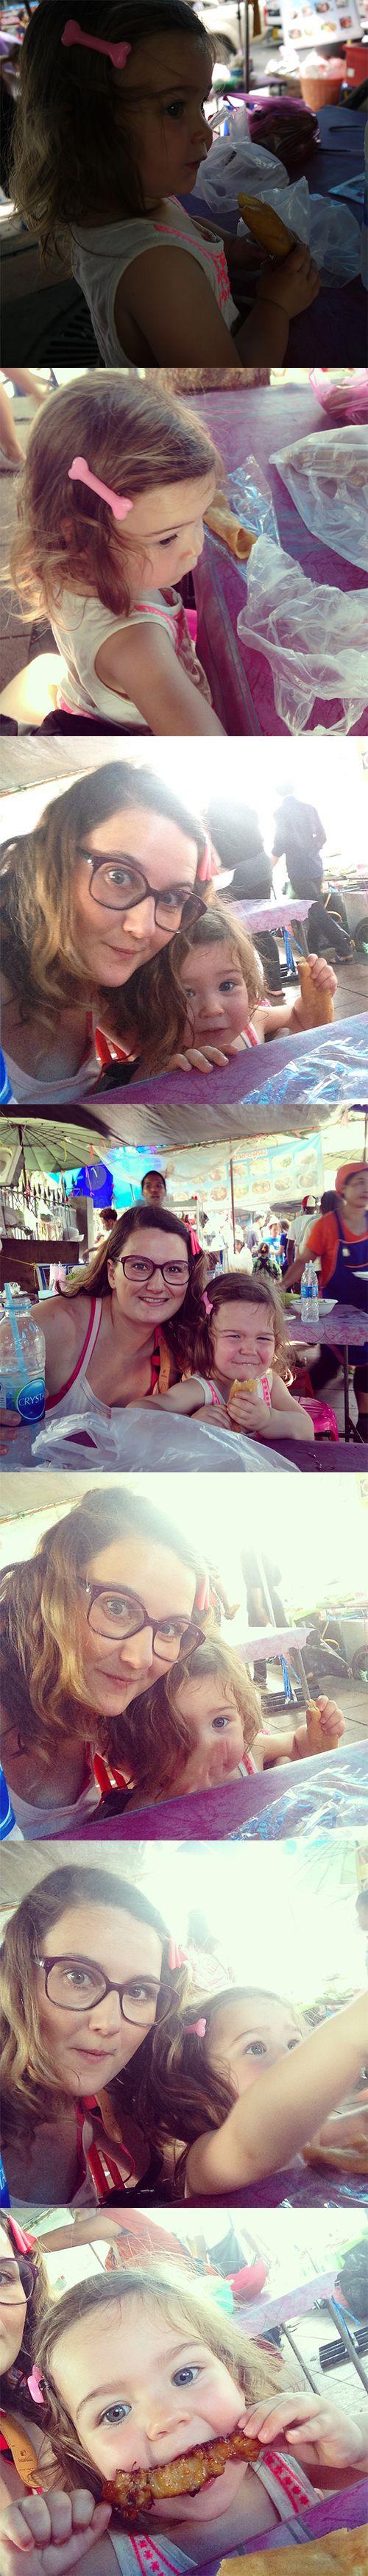 Bangkok-voyage-famille-pimpandpomme-thailande-10